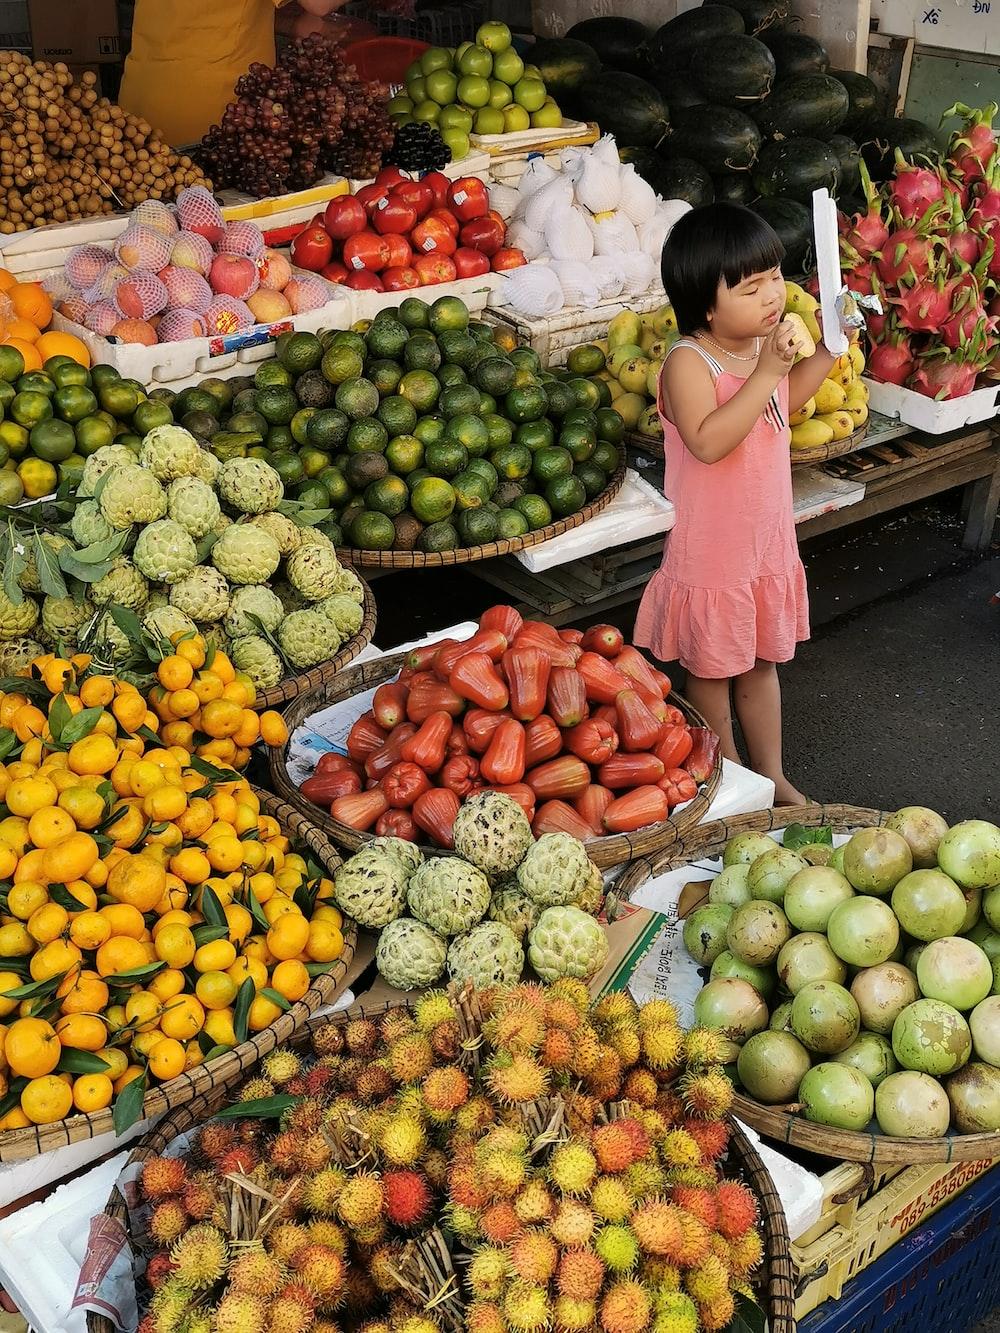 woman in pink long sleeve shirt standing beside fruits